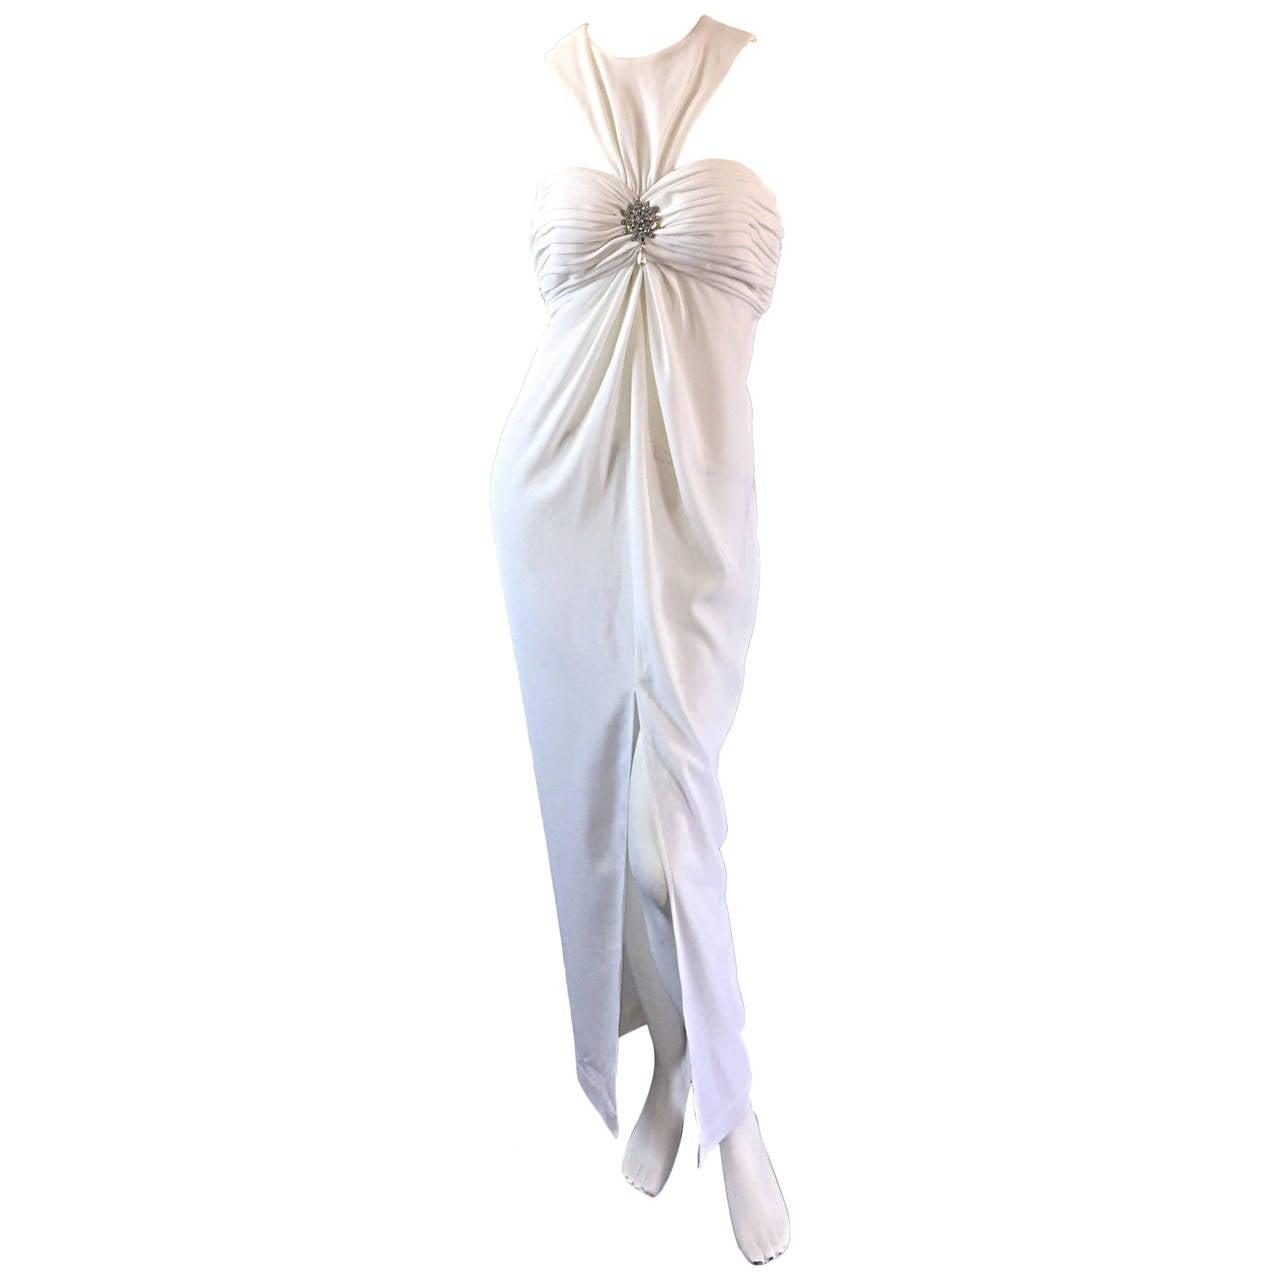 1990s Vintage Tadashi Shoji White 90s Grecian Dress w/ Rhinestones + Pearl For Sale